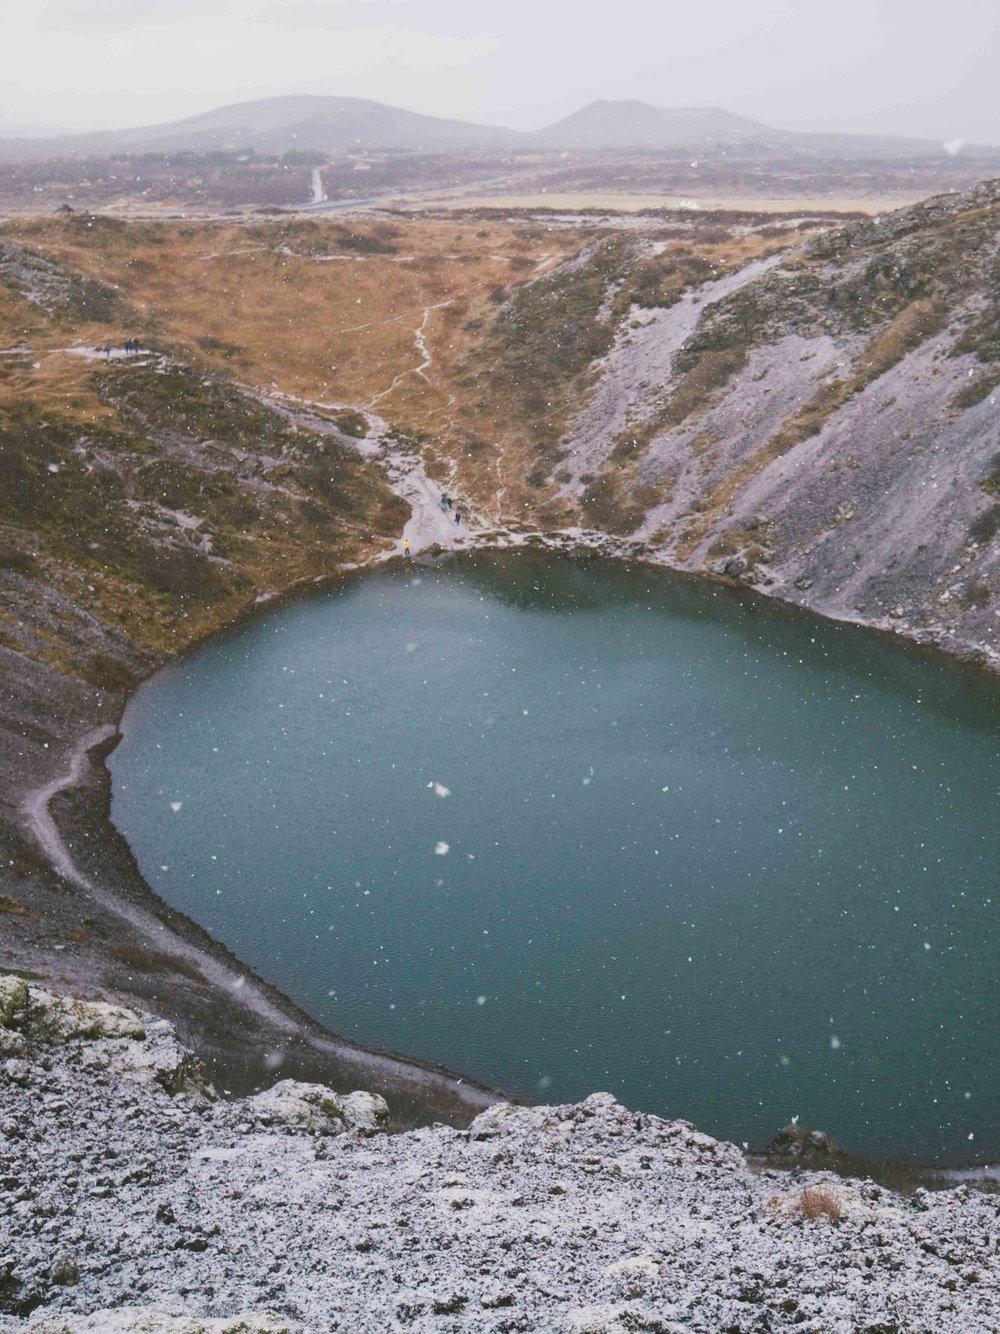 Kerig Crater Lake